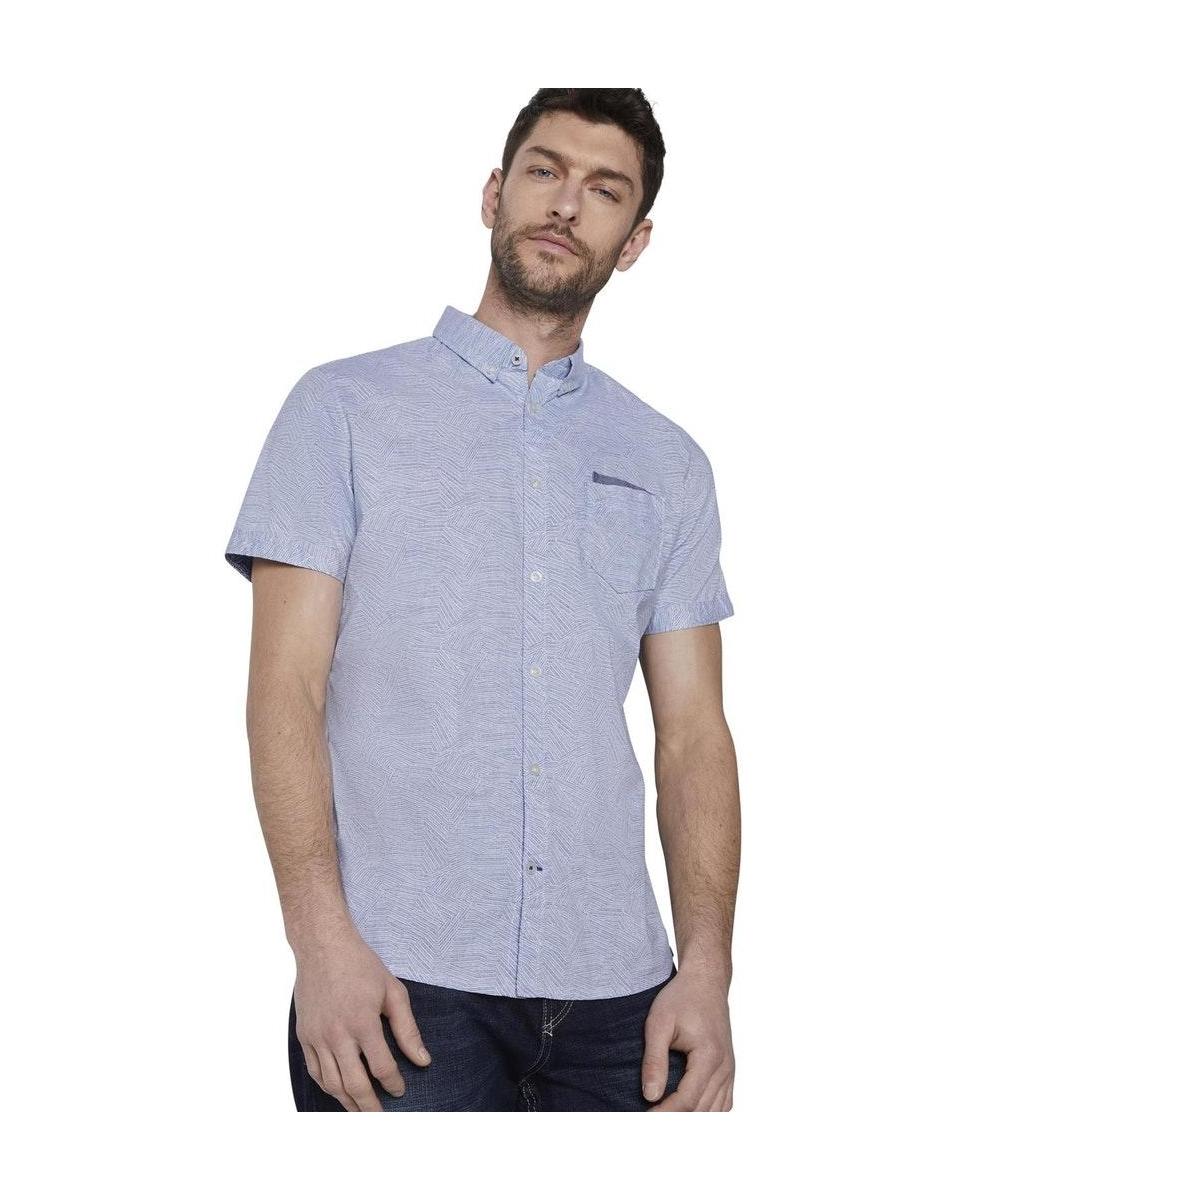 overhemd met korte mouwen en borstzak 1017176xx10 tom tailor overhemd 22148